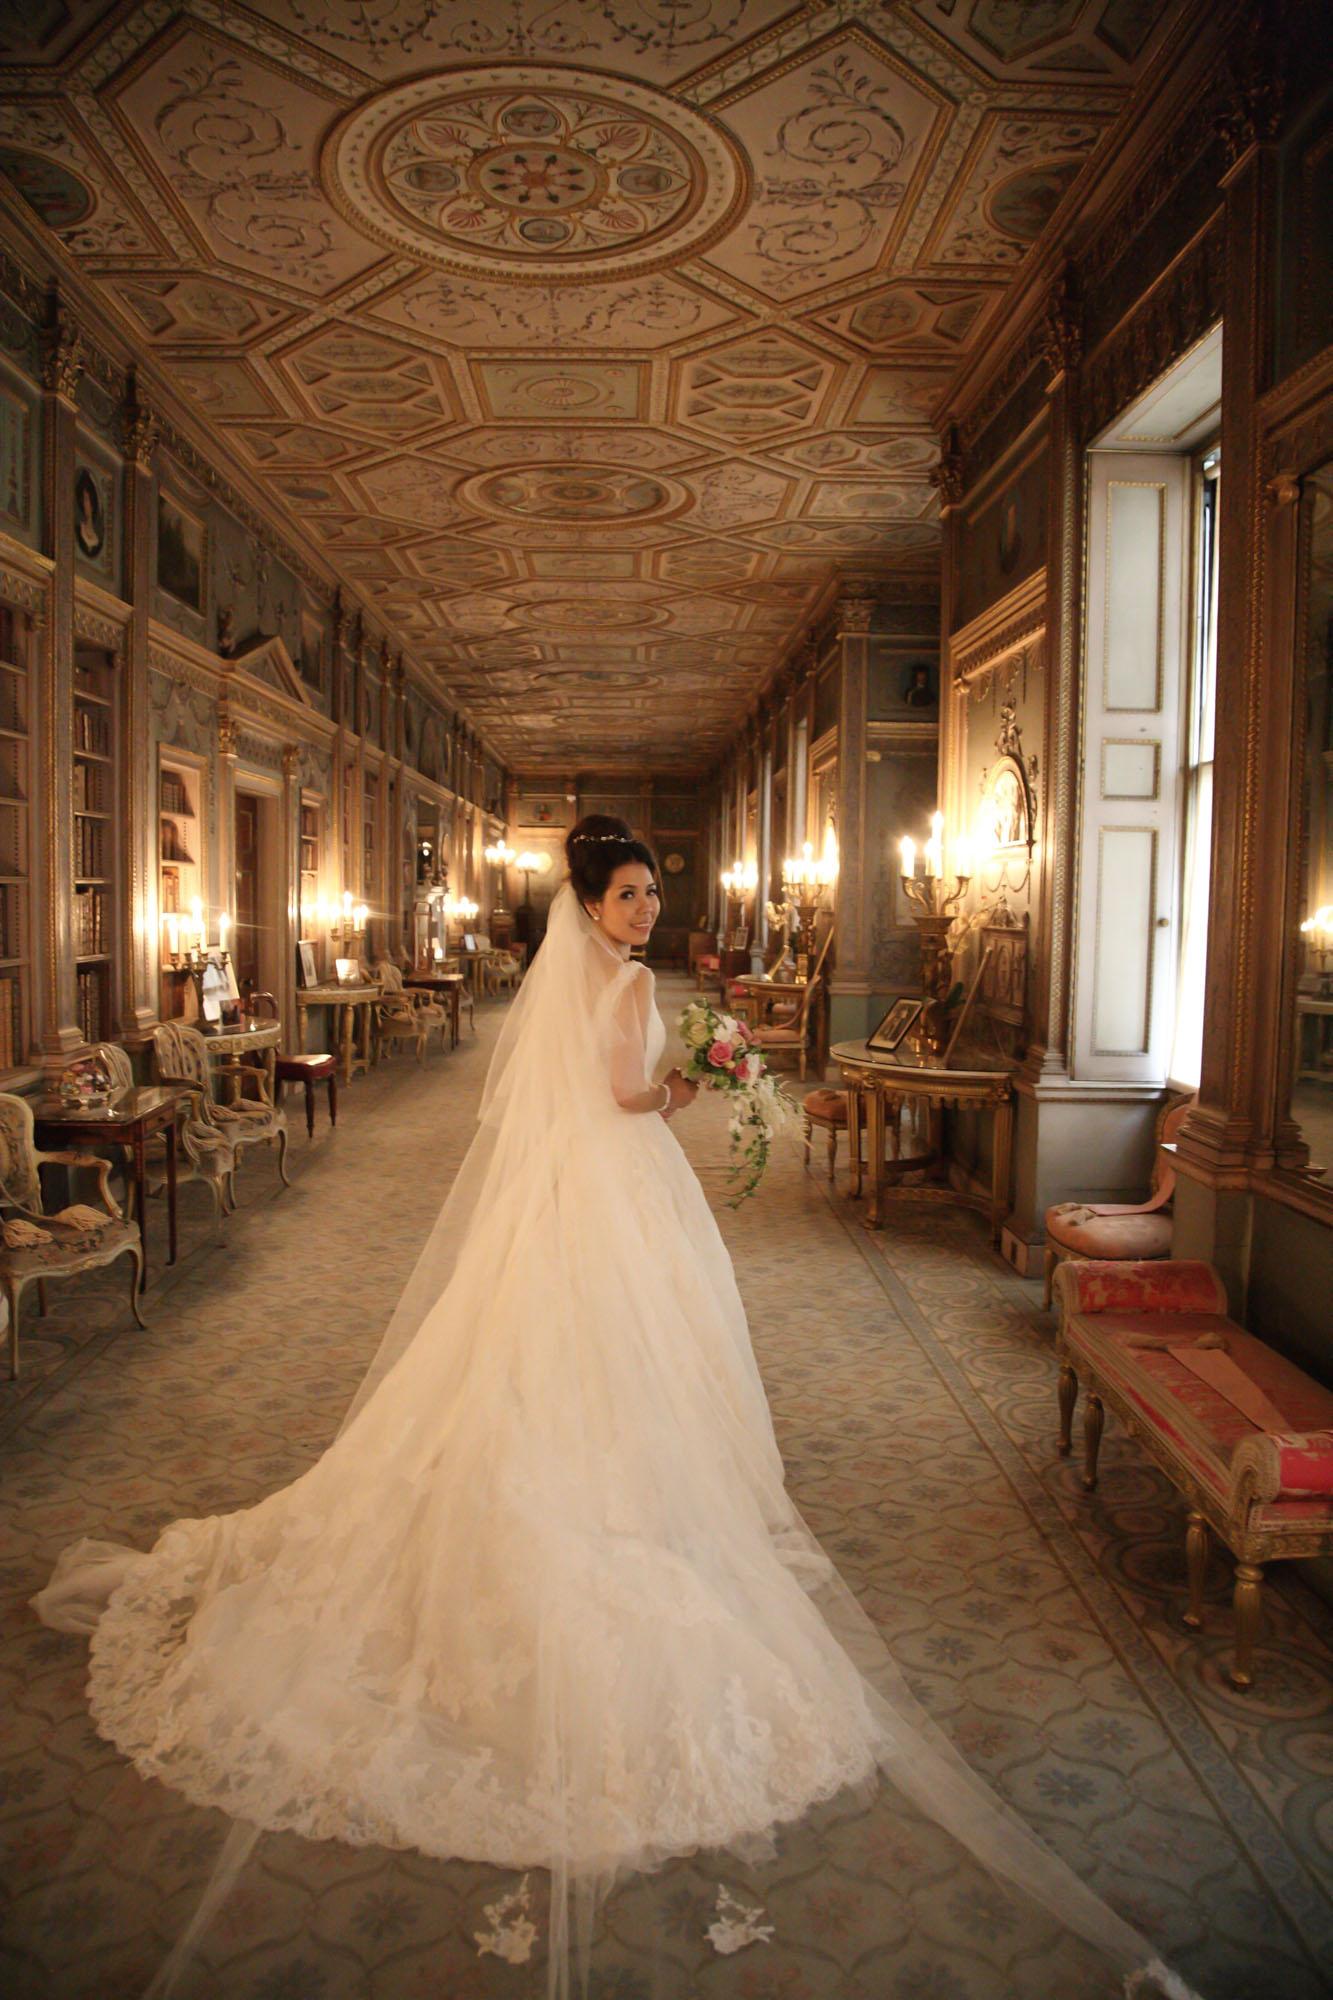 weddings-couples-love-photographer-oxford-london-jonathan-self-photography-21.jpg